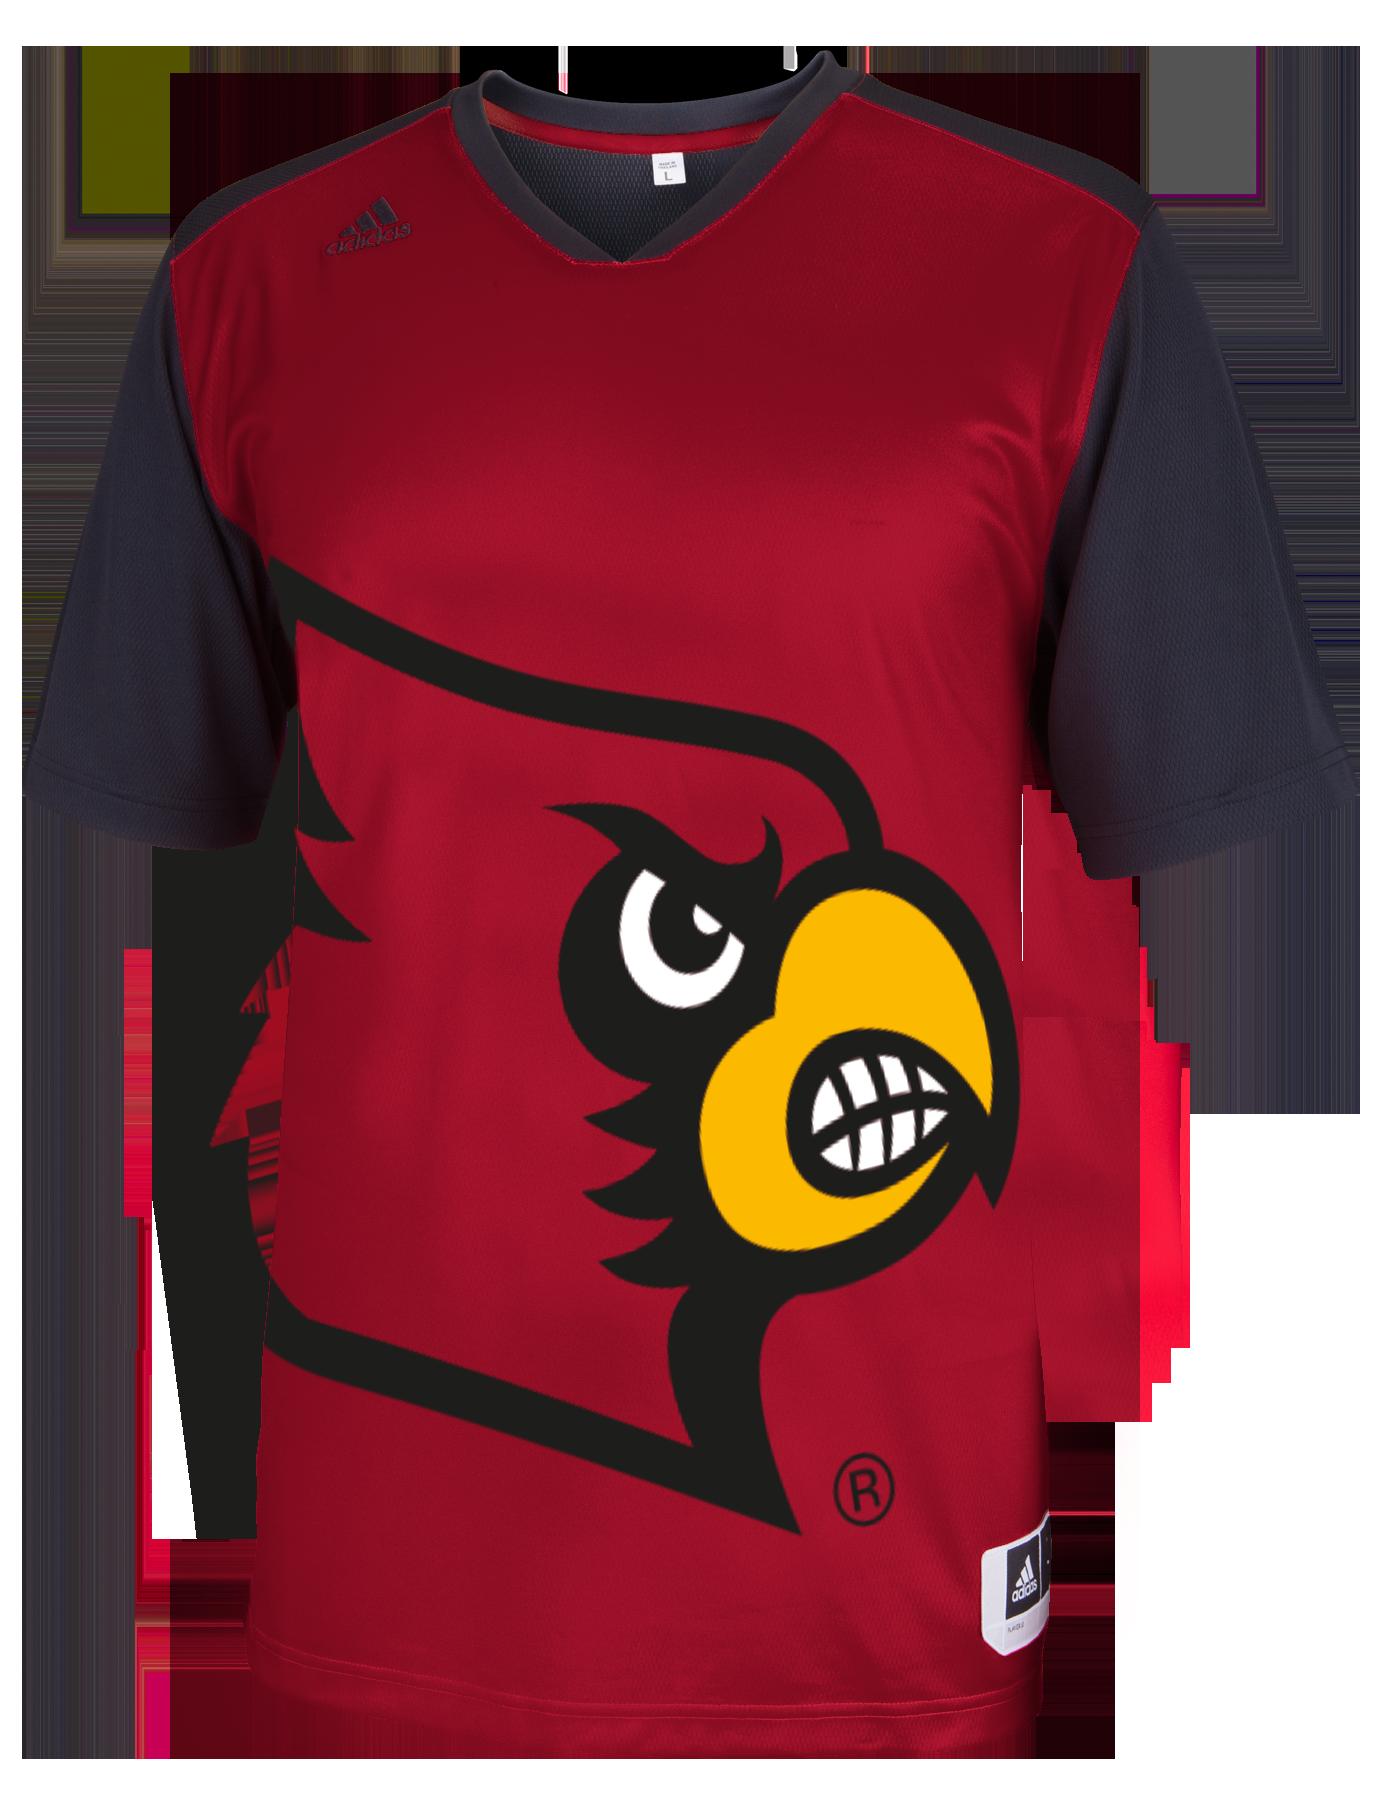 Baseball shirt ideas clipart vector Custom Basketball Shooting Shirts and Warm Up Hoodies vector